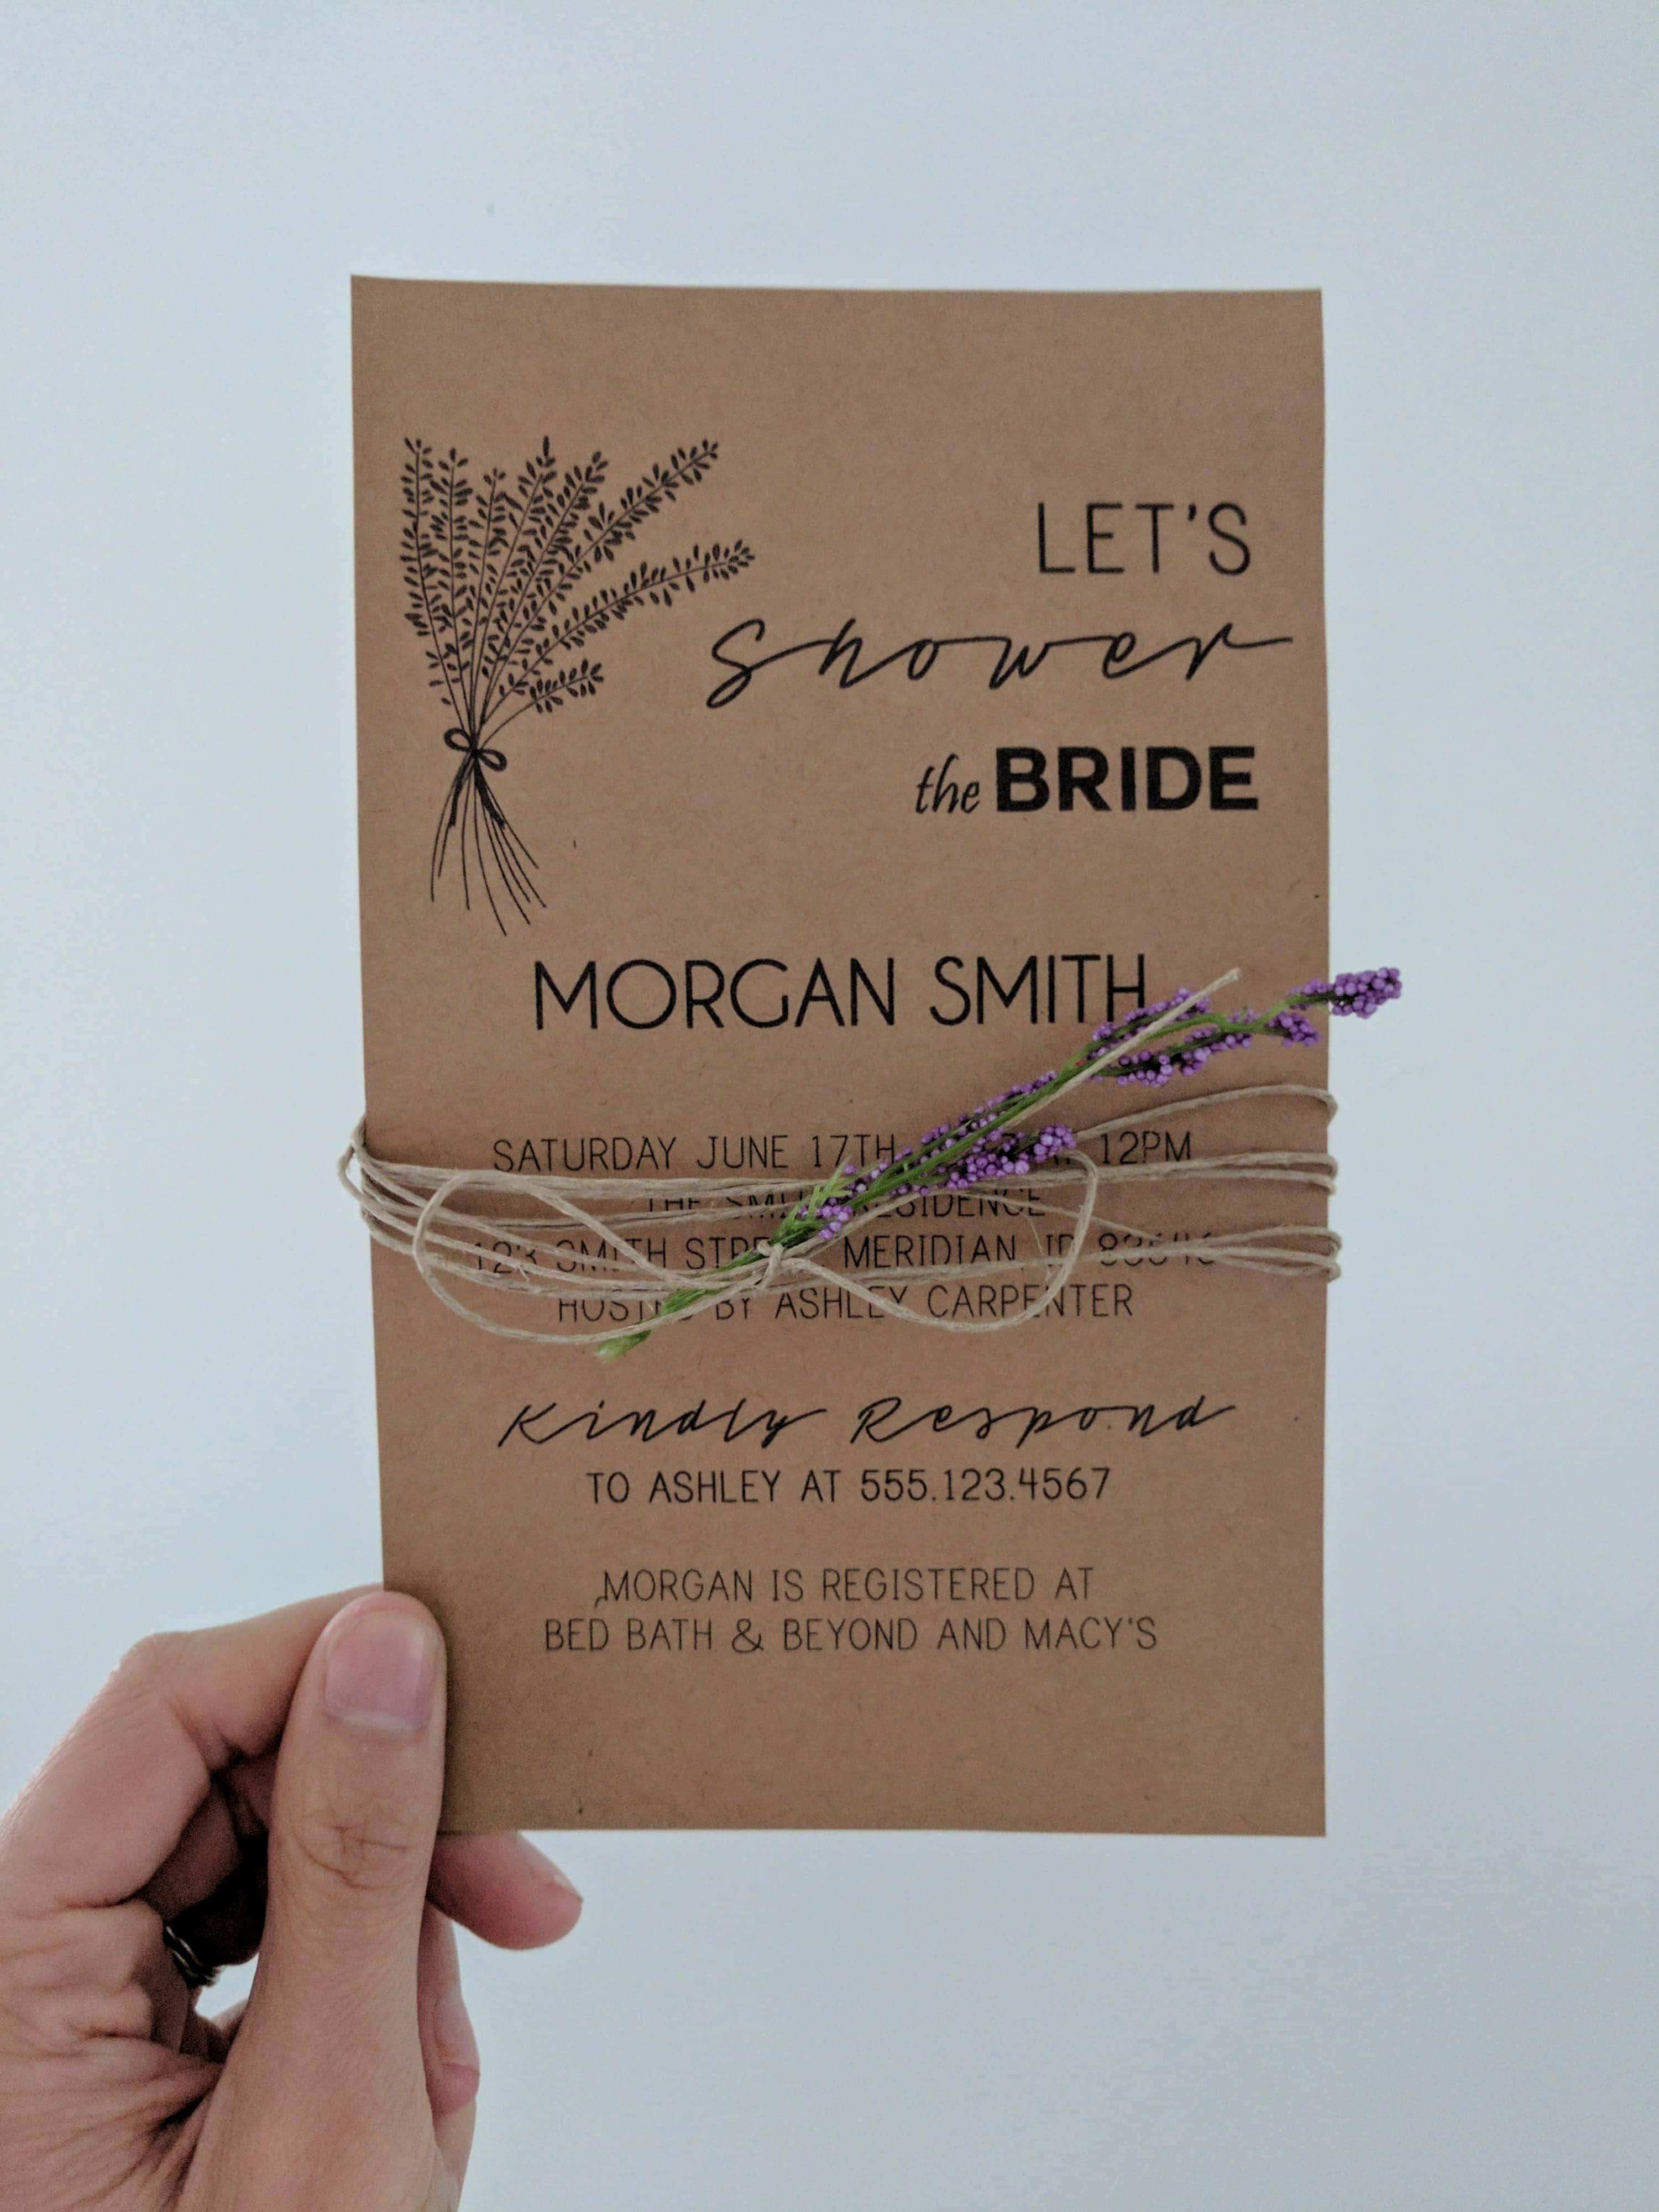 card templates for wedding invitation%0A DIY Invitations Using Microsoft Publisher